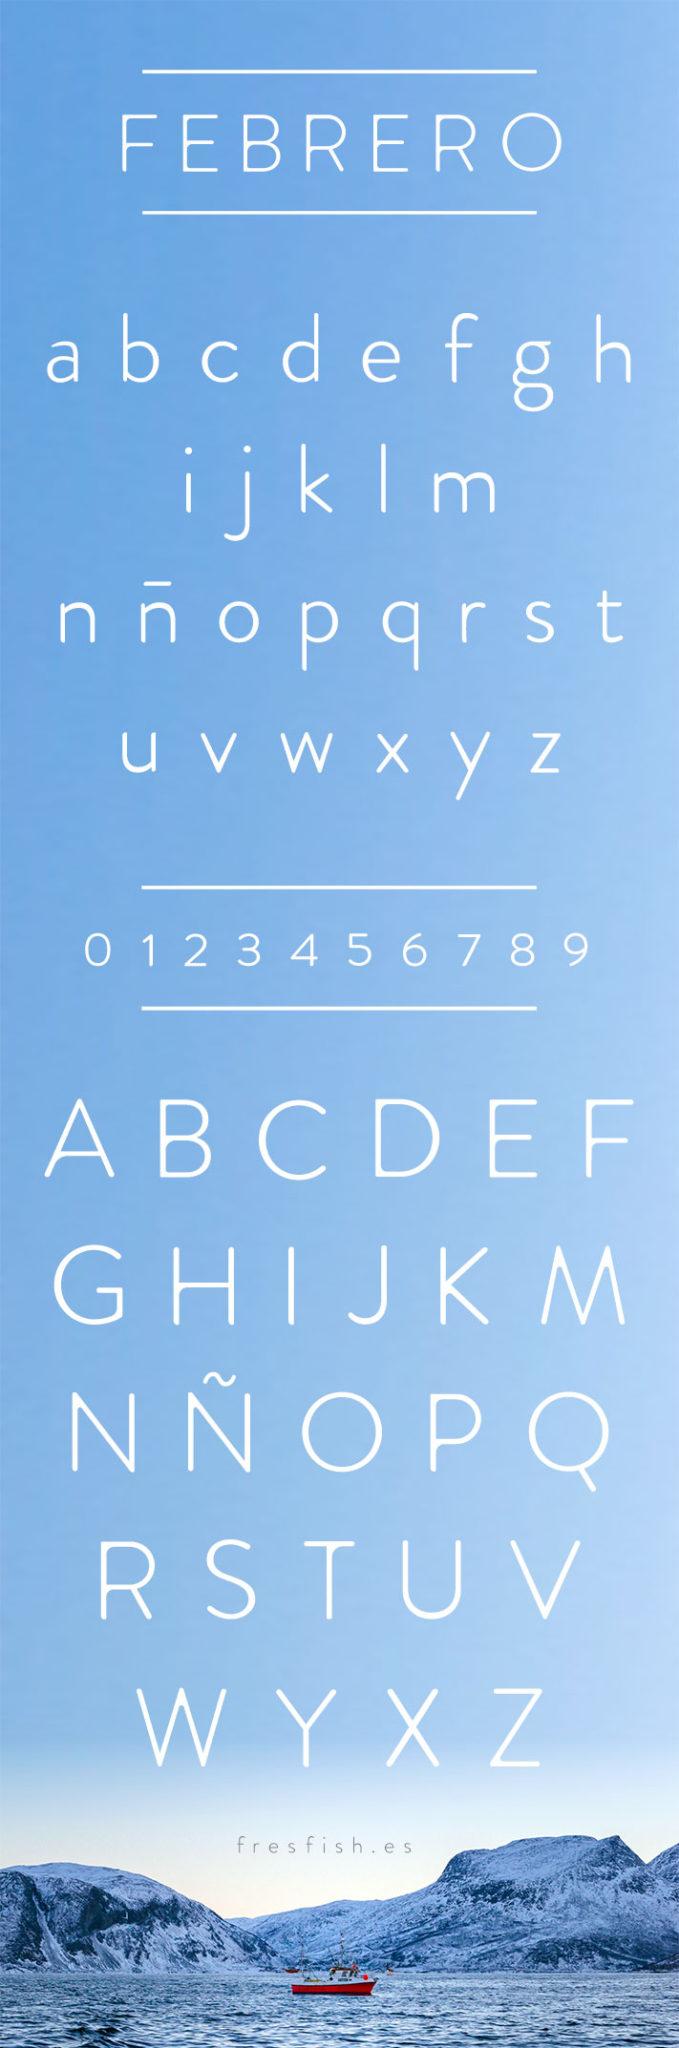 tipografia-freshfish